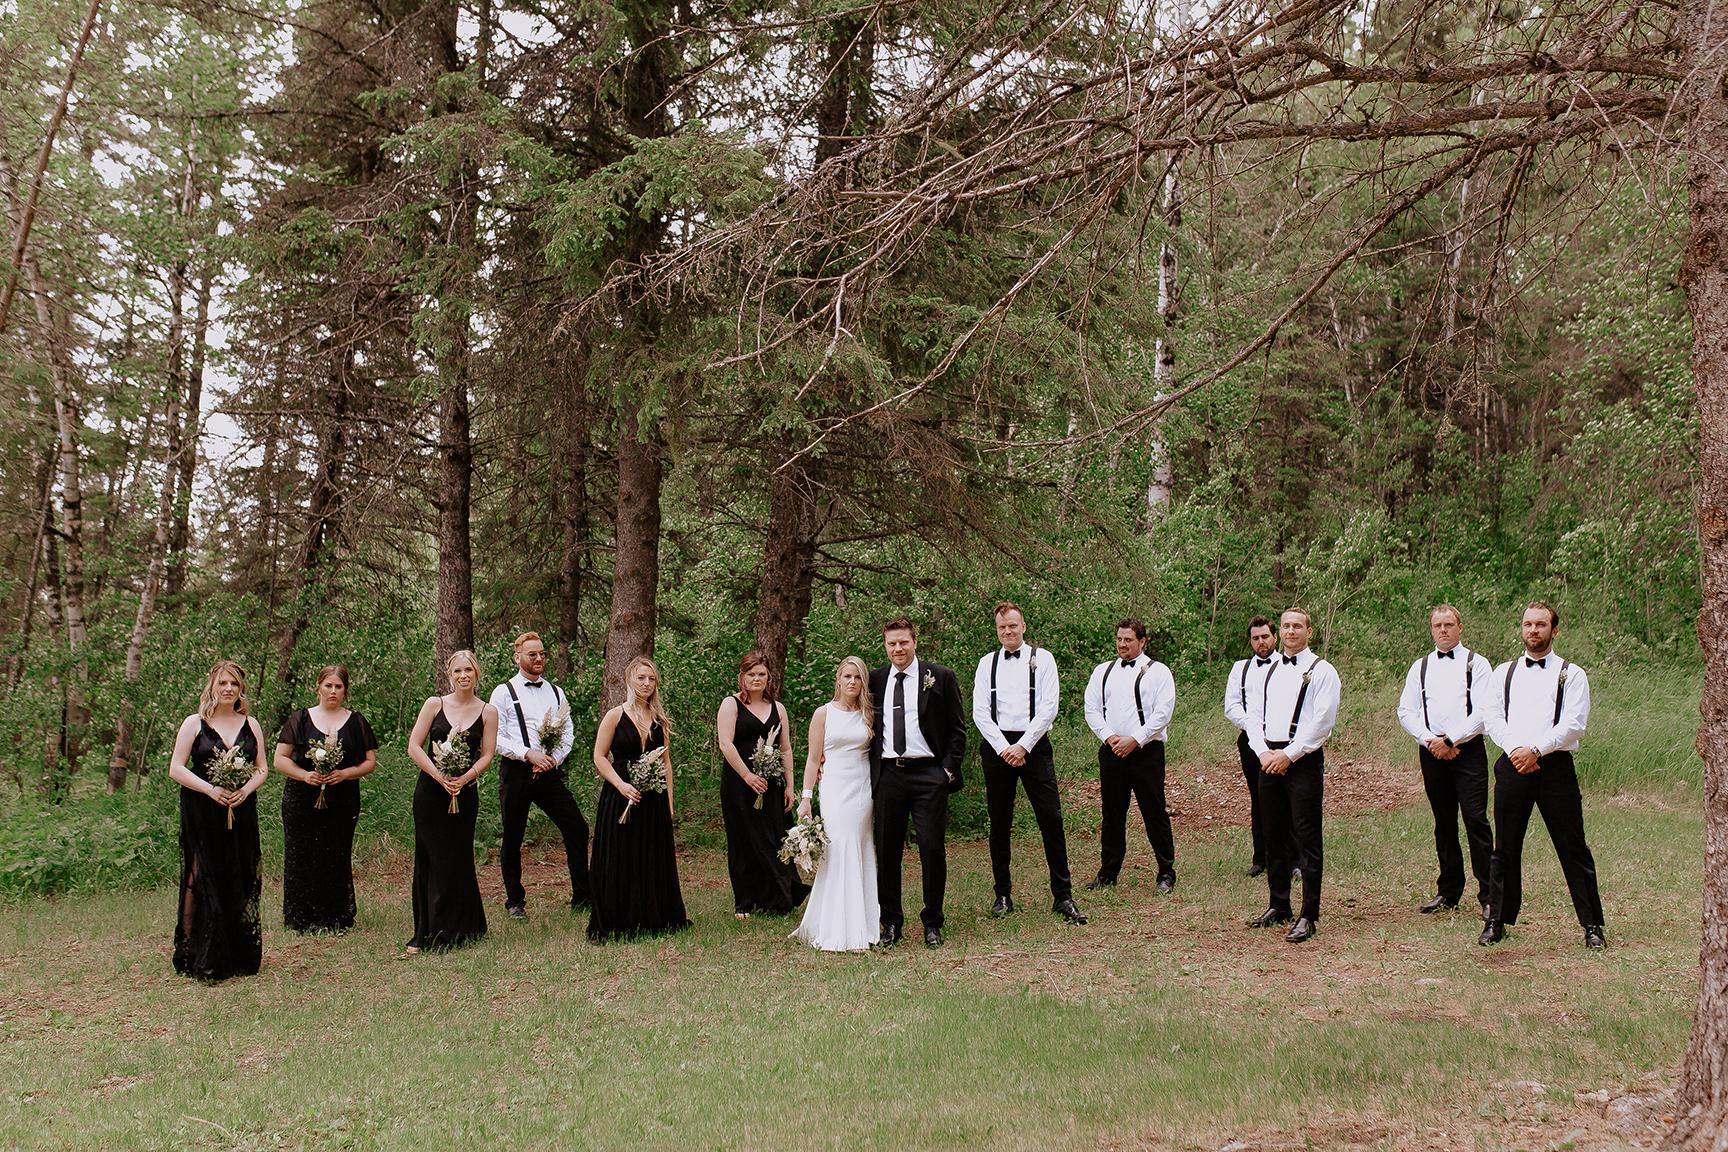 Bridal_Party_22_web.jpg